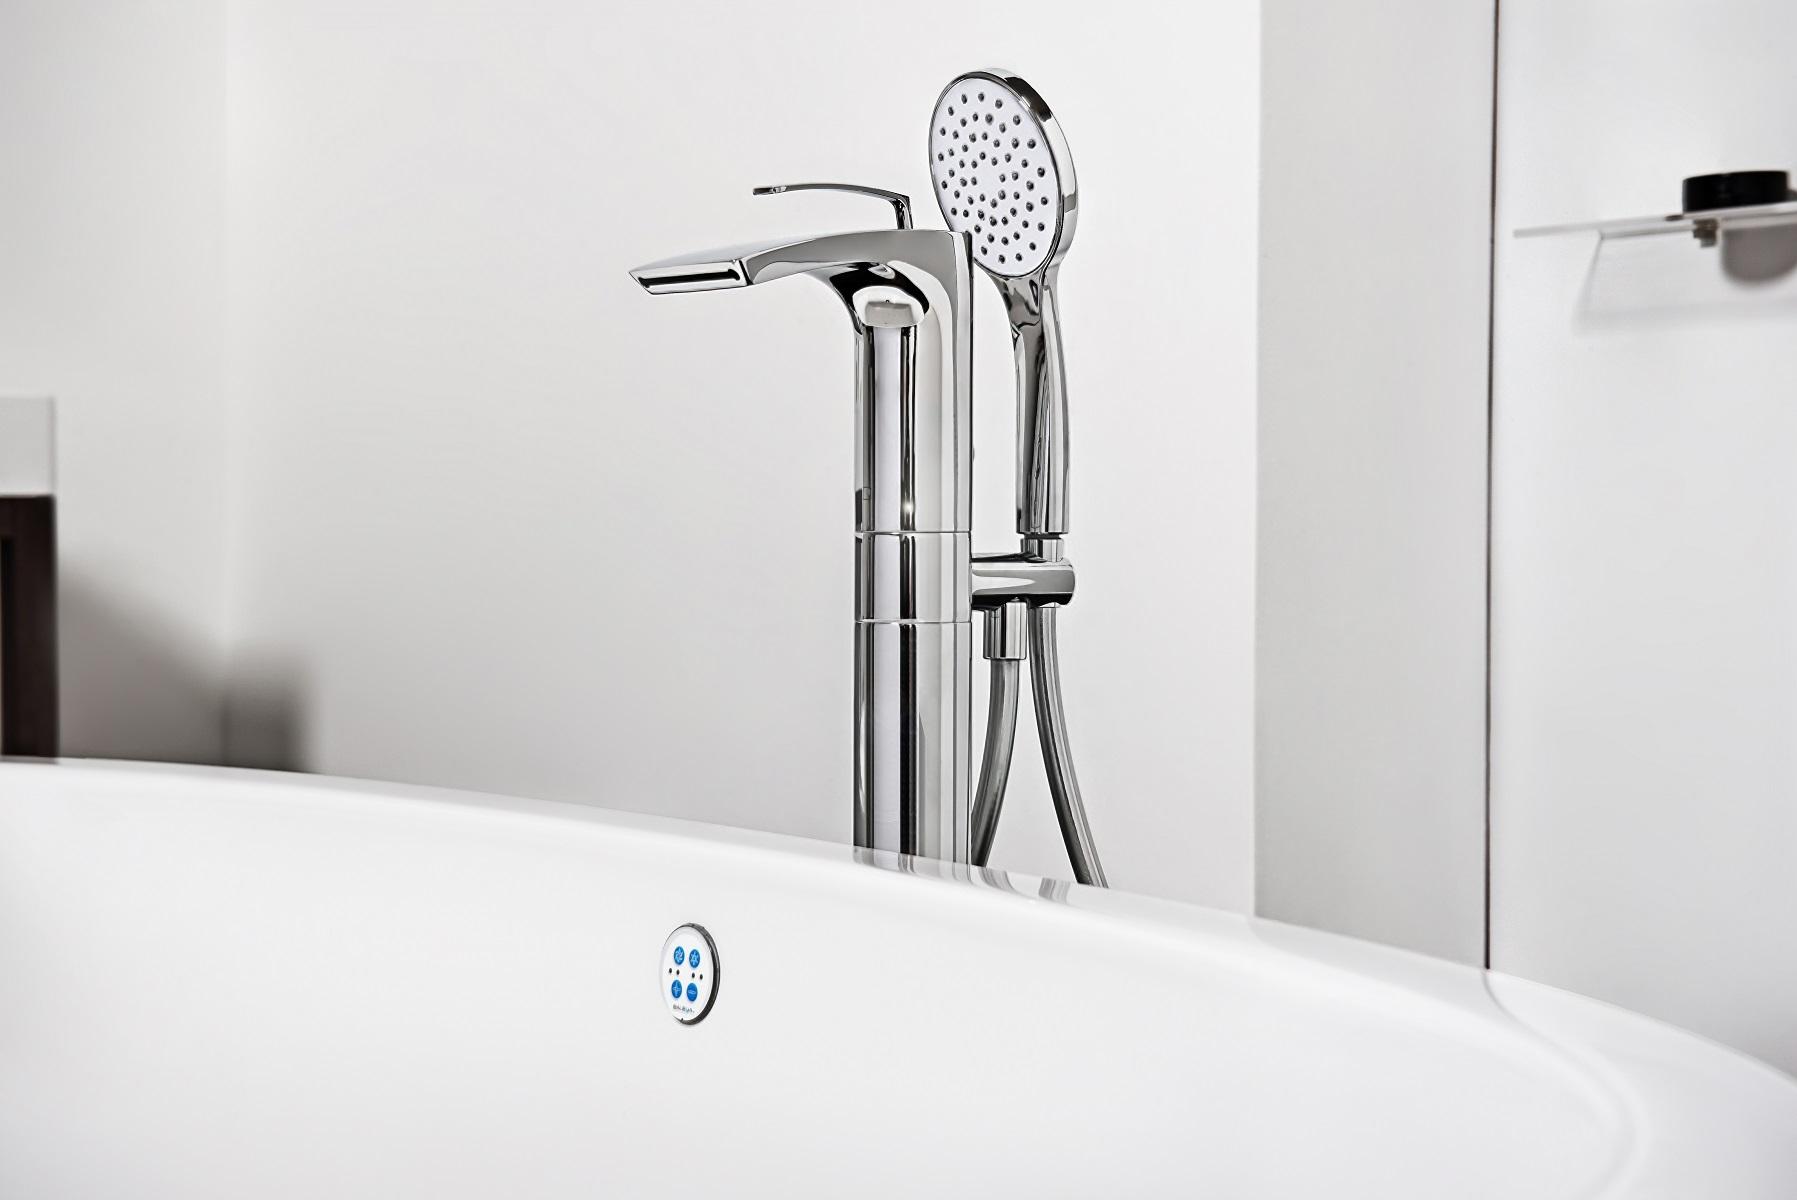 Bollicine Floor Mounted Bath Filler ChromeDSC2830